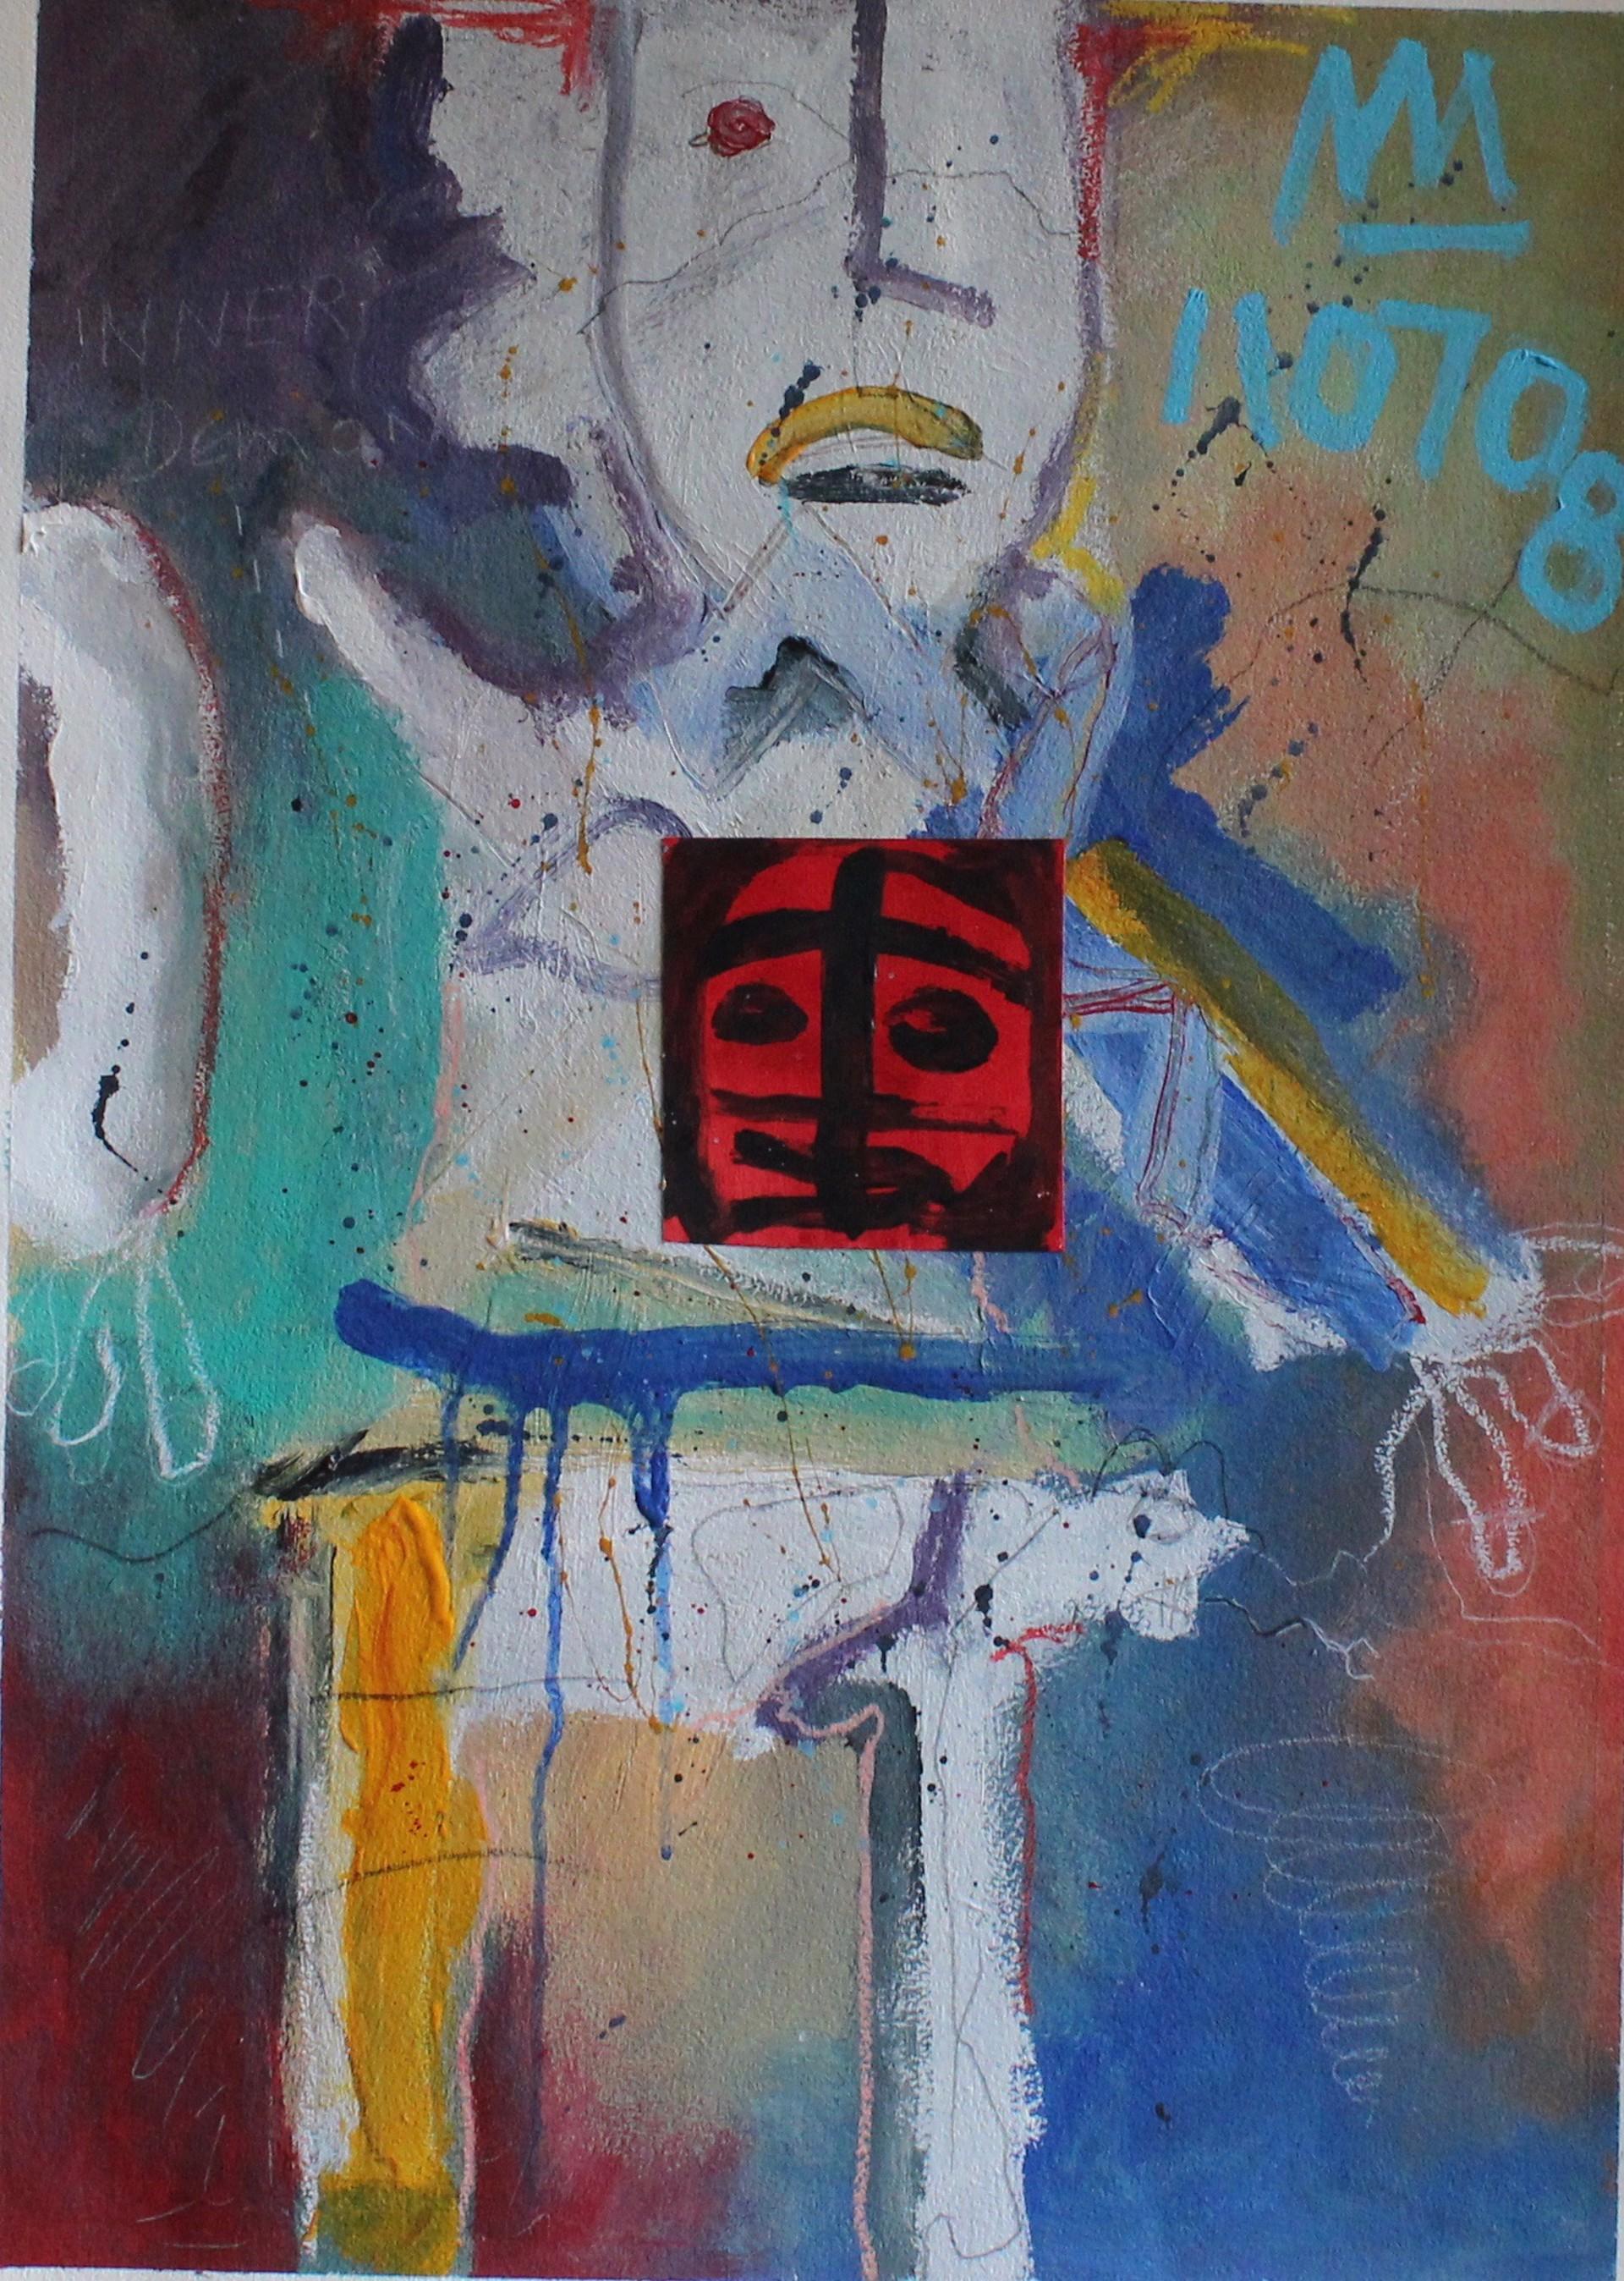 Inner Demon by Michael Snodgrass